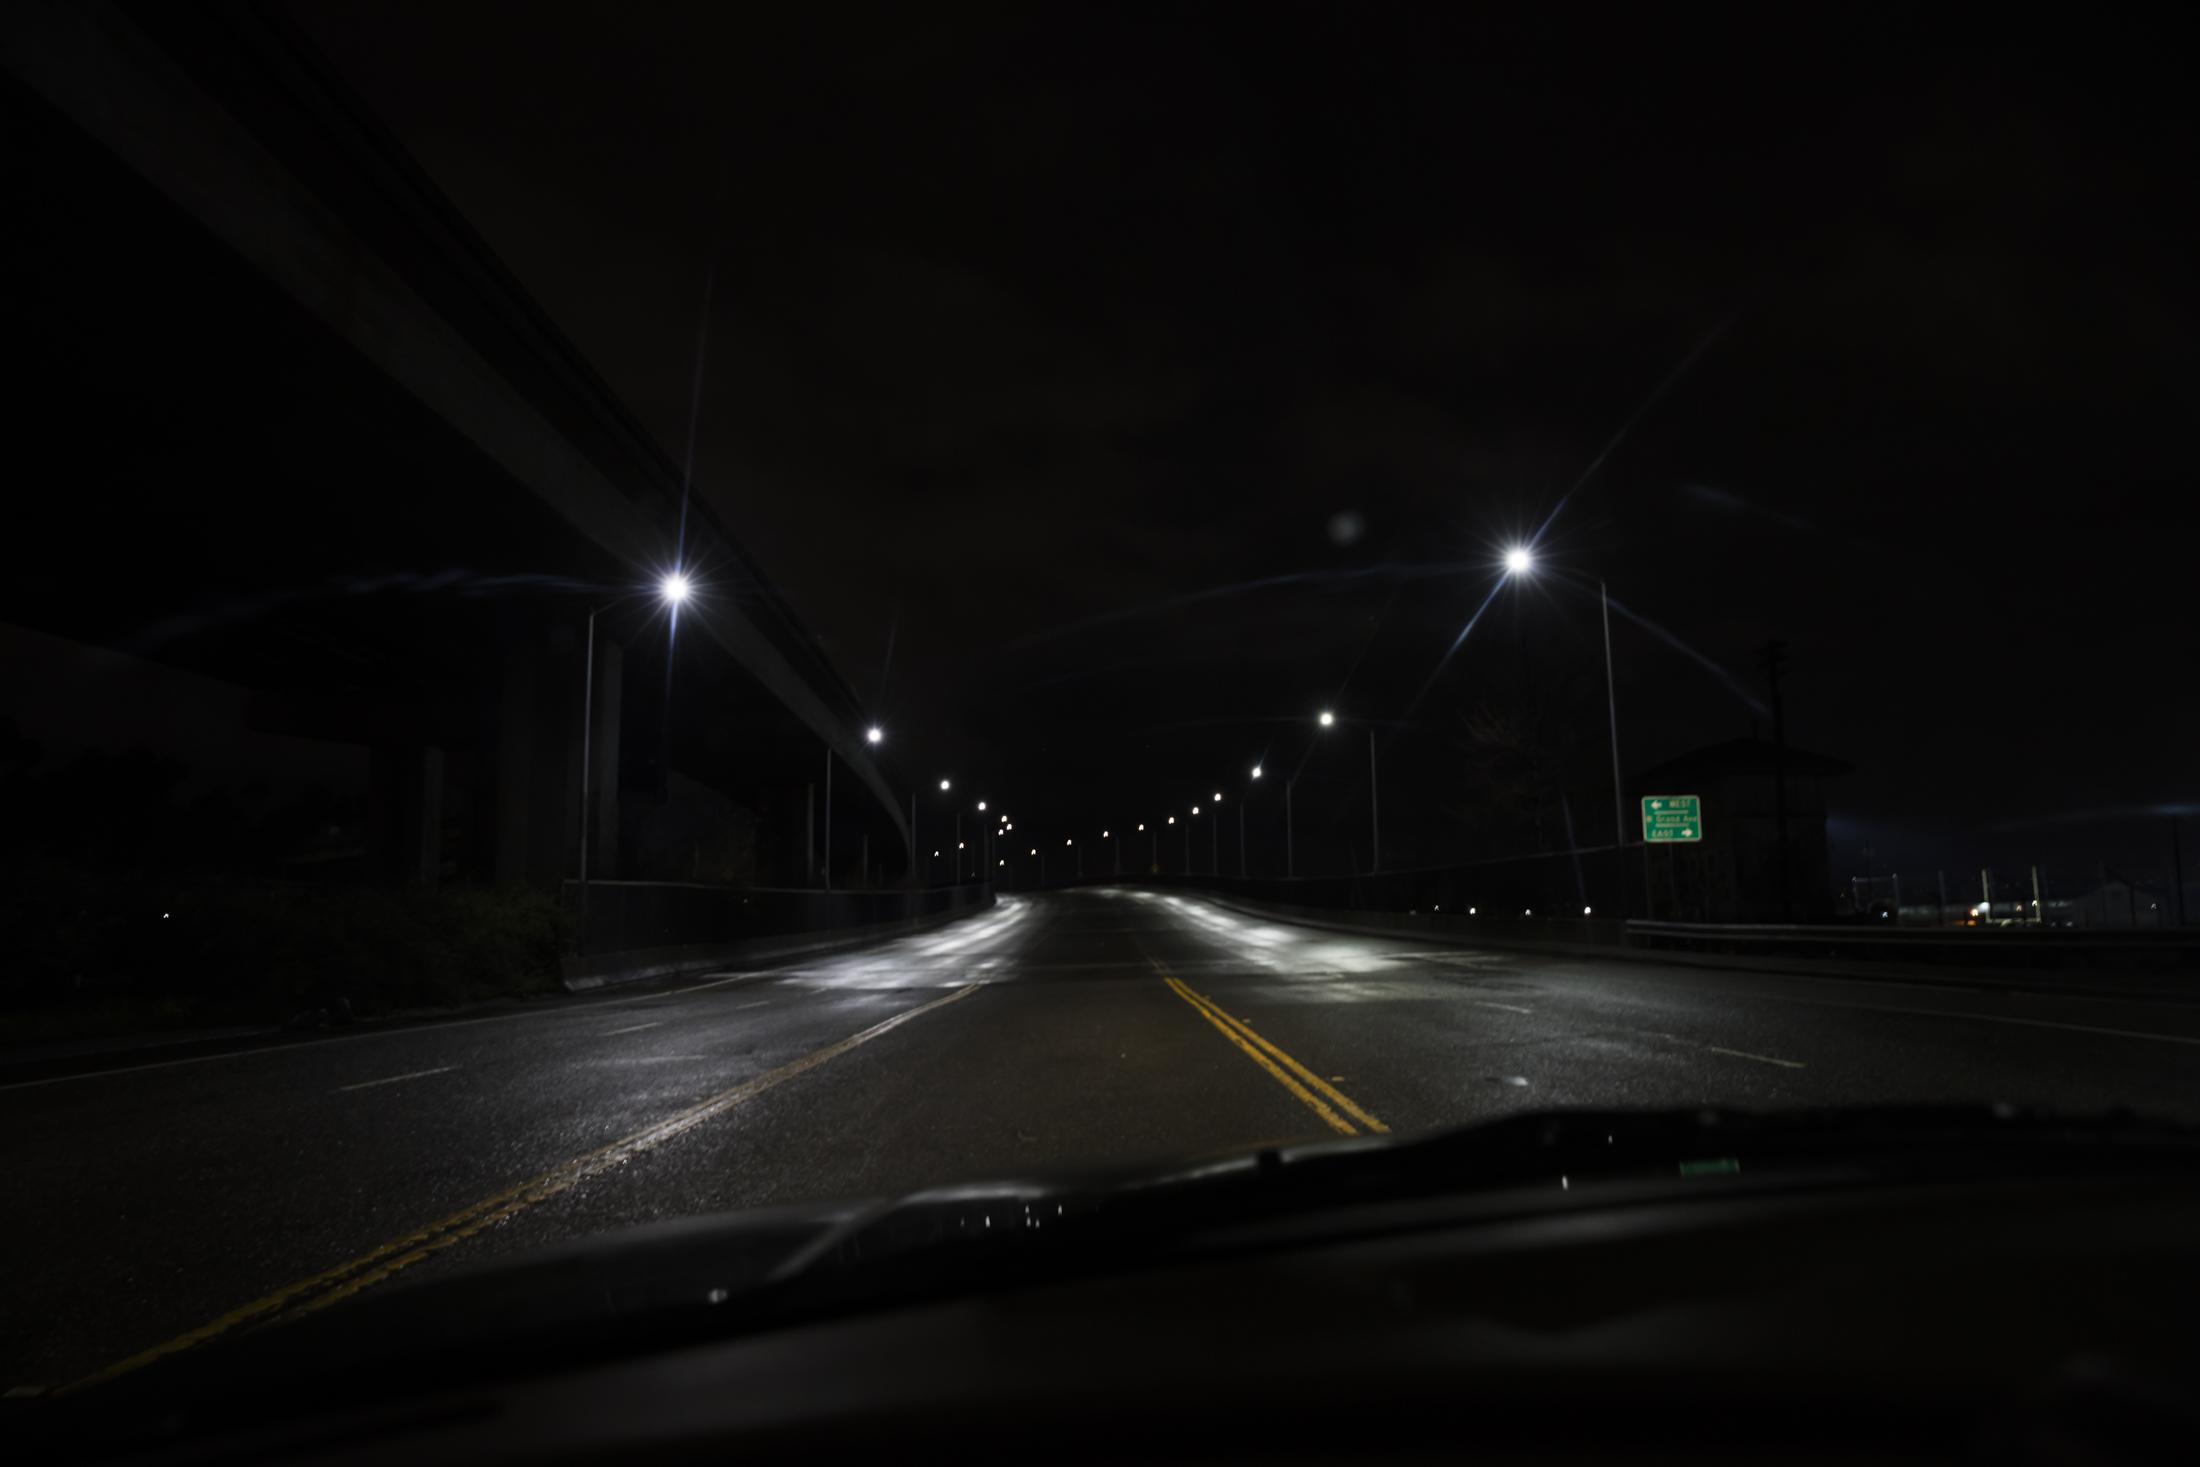 nightdrive-3.jpg